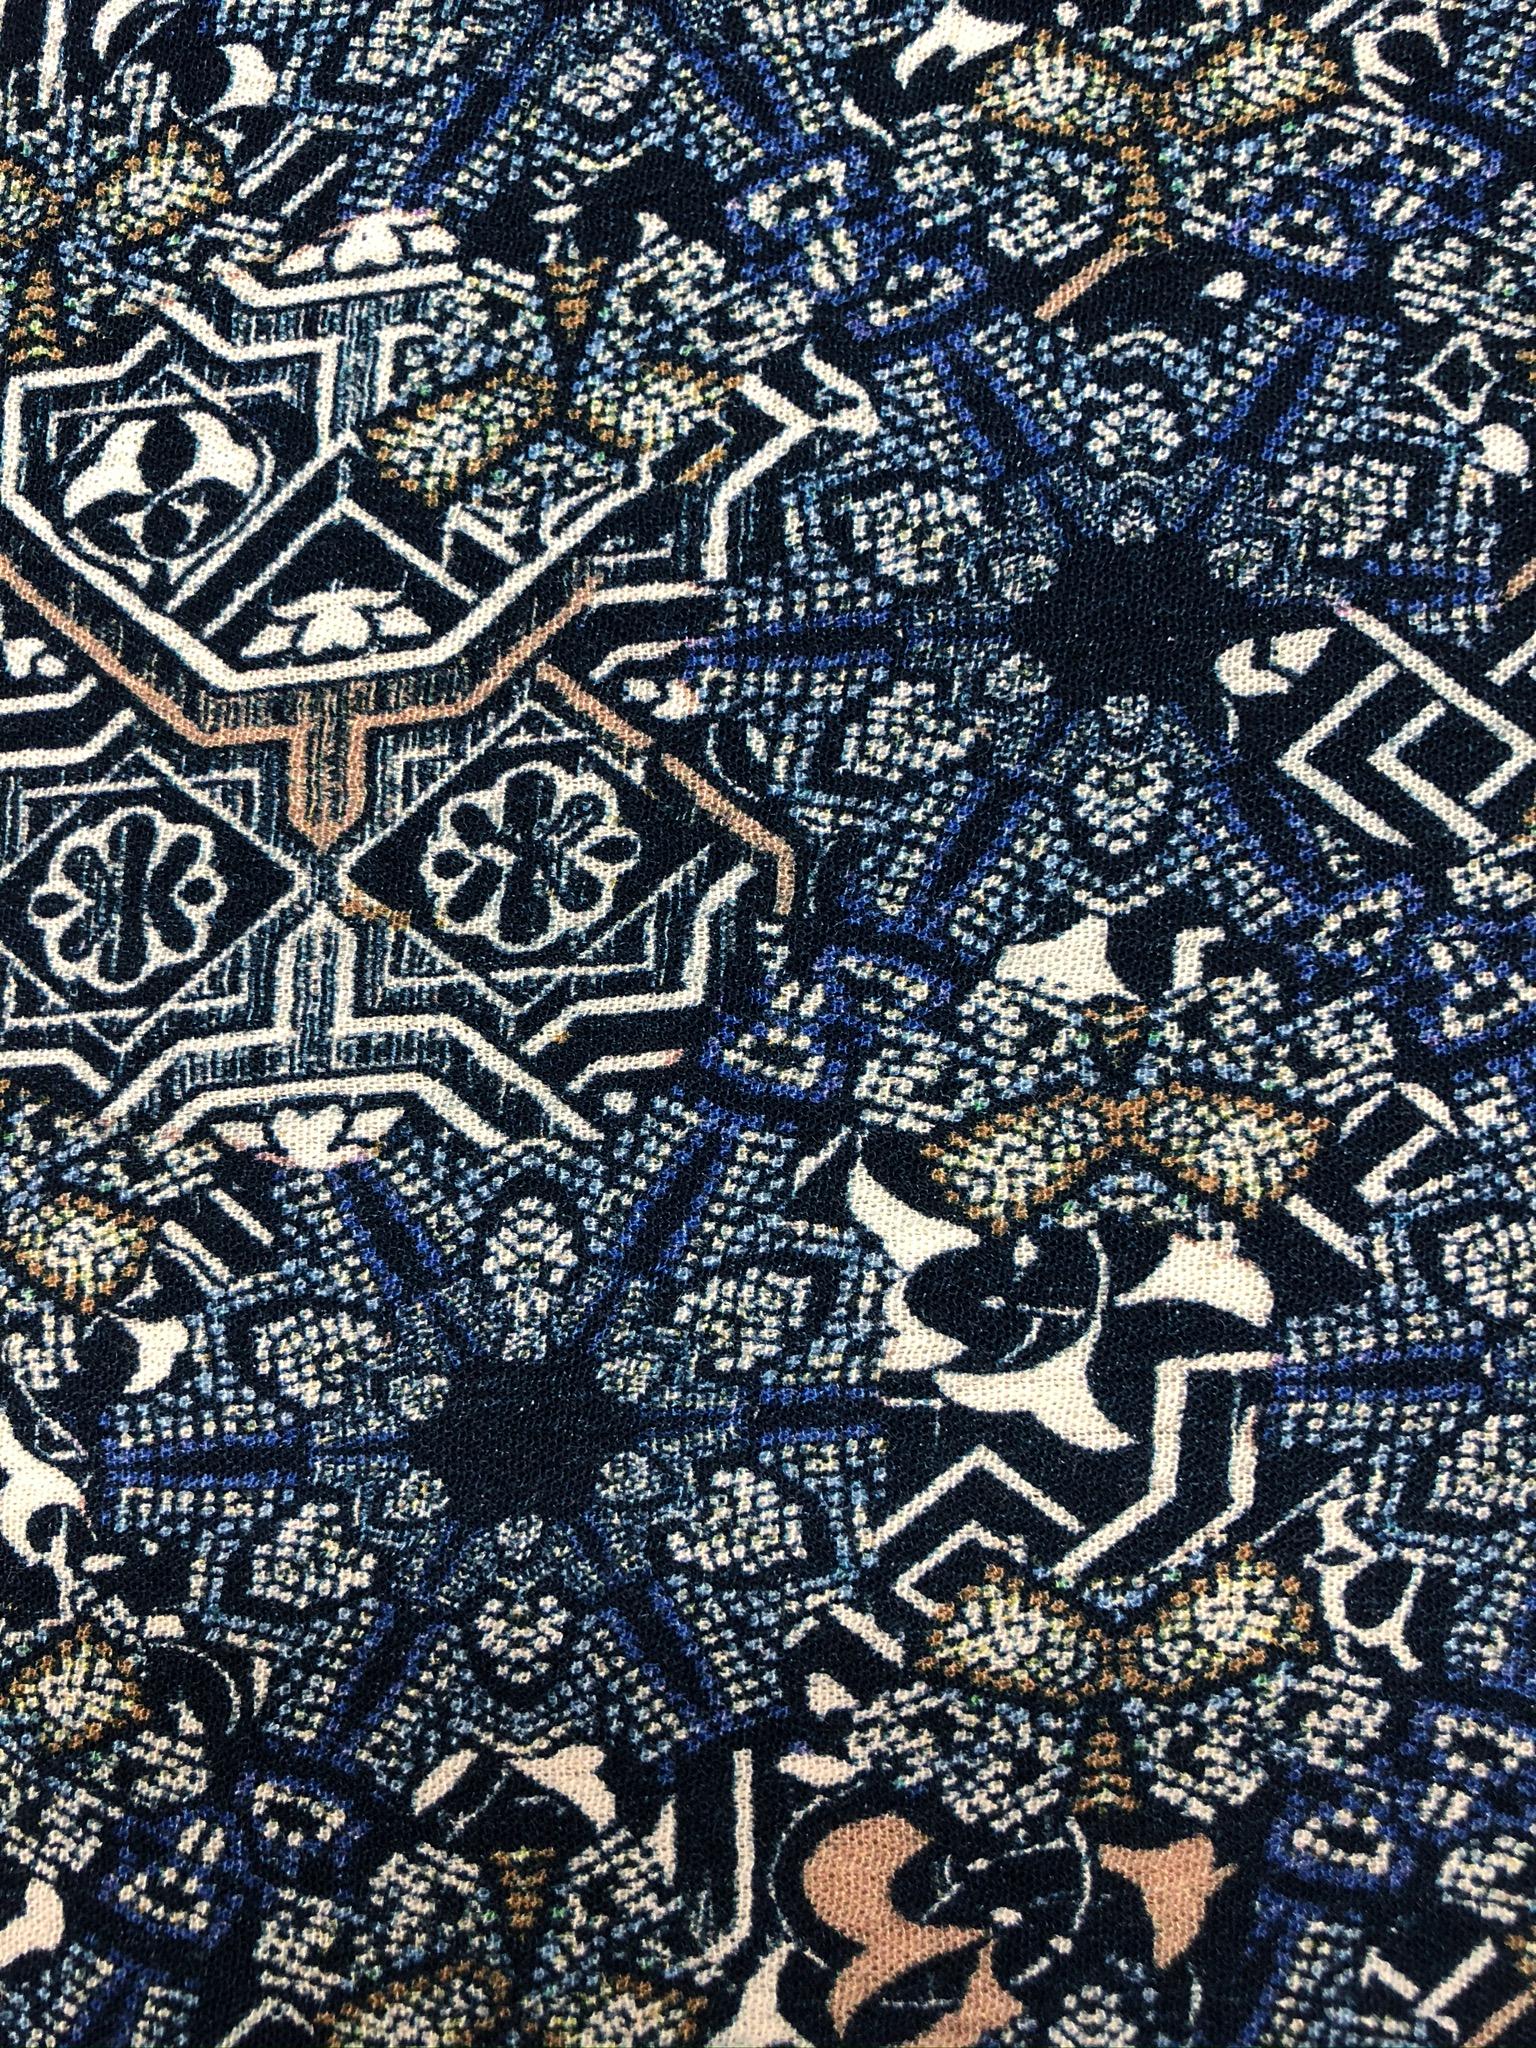 Moroccan Tile blue